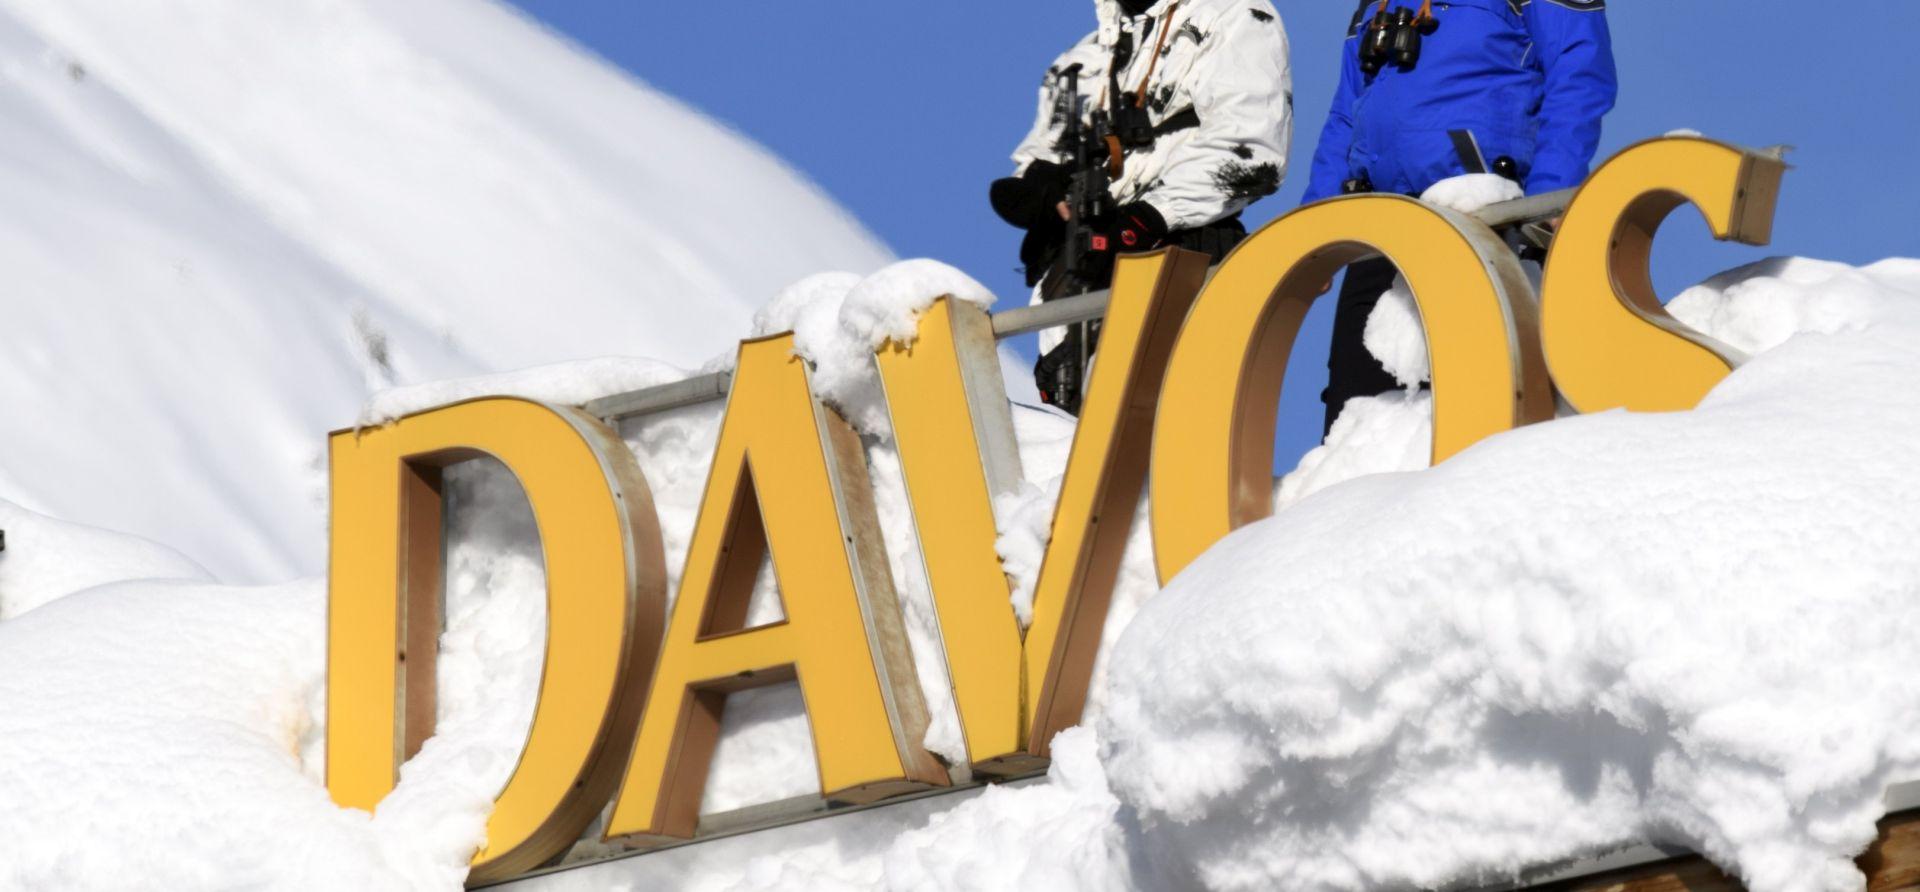 Glavne zvijezde Davosa su Merkel, Macron, Trump i May